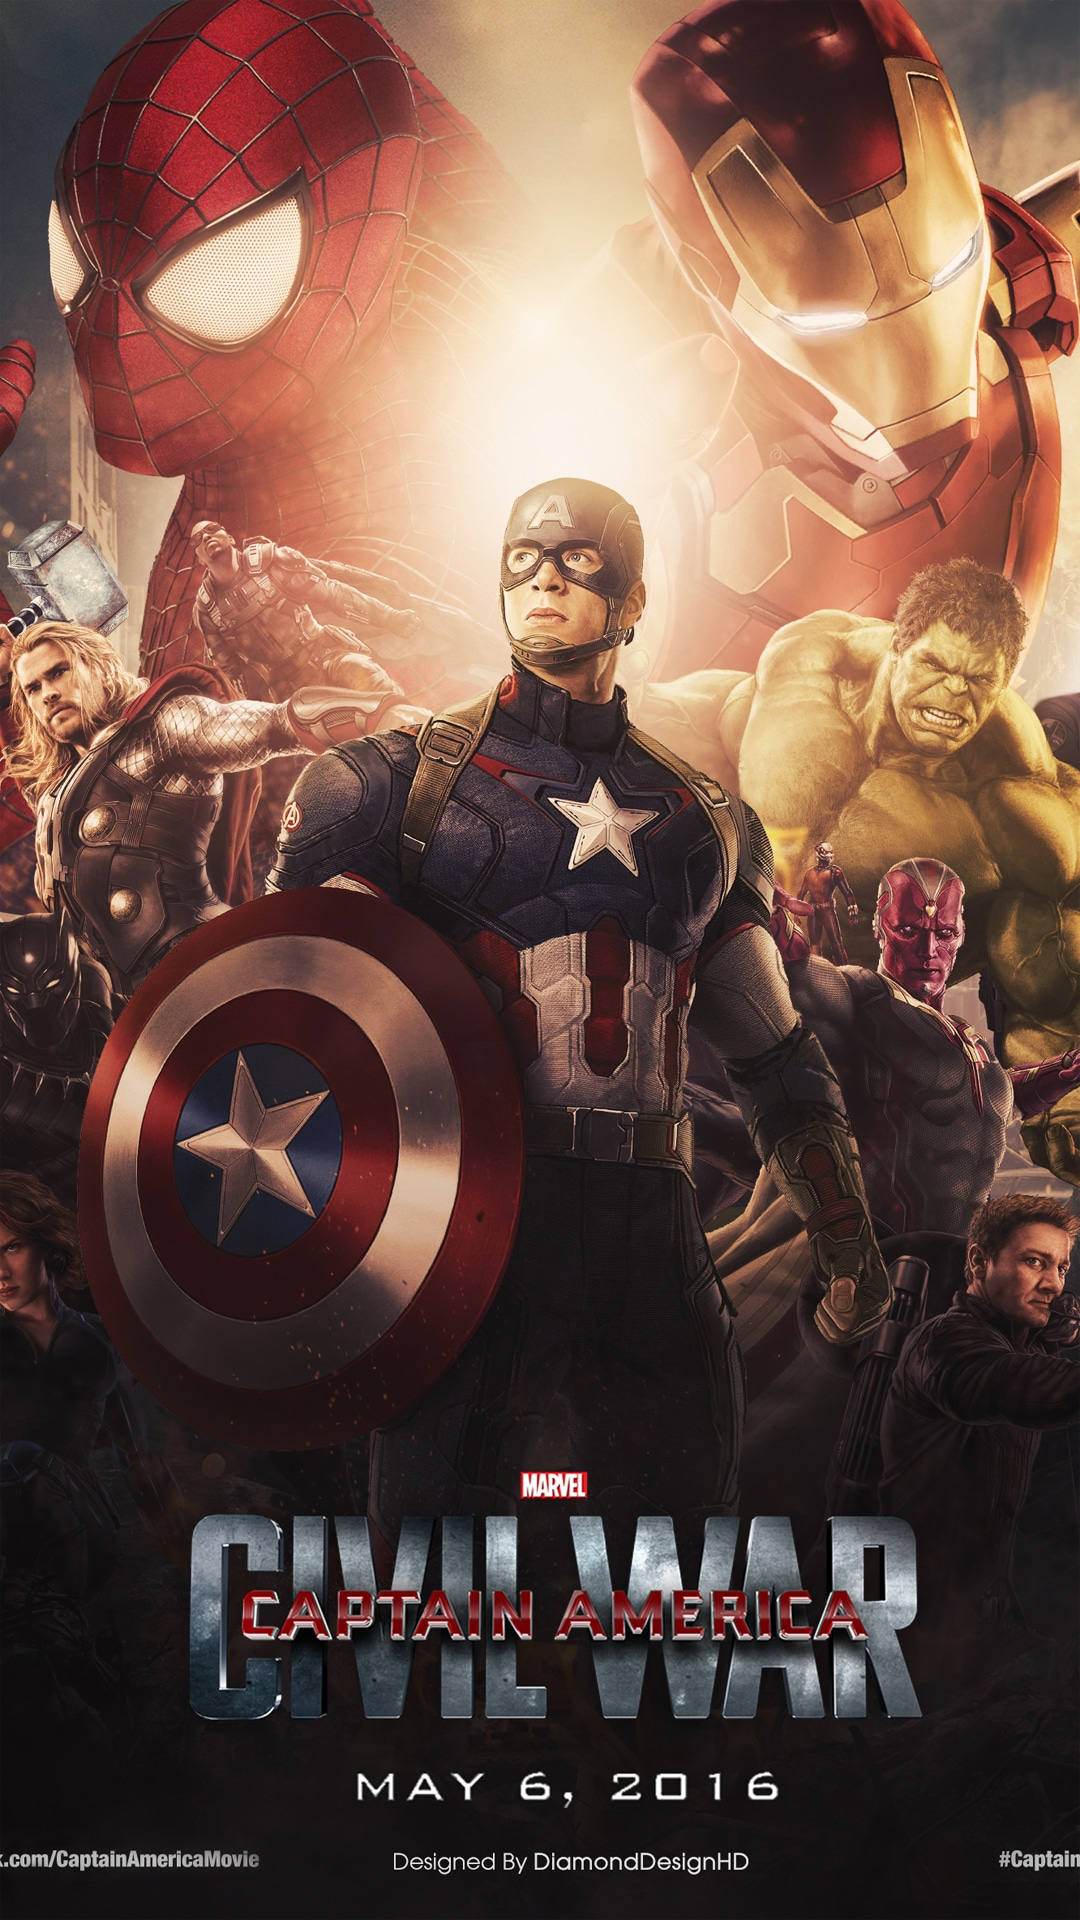 Great Wallpaper Movie Captain America Civil War - Captain-America-Civil-War-WALLPAPER6  2018_793939.jpg